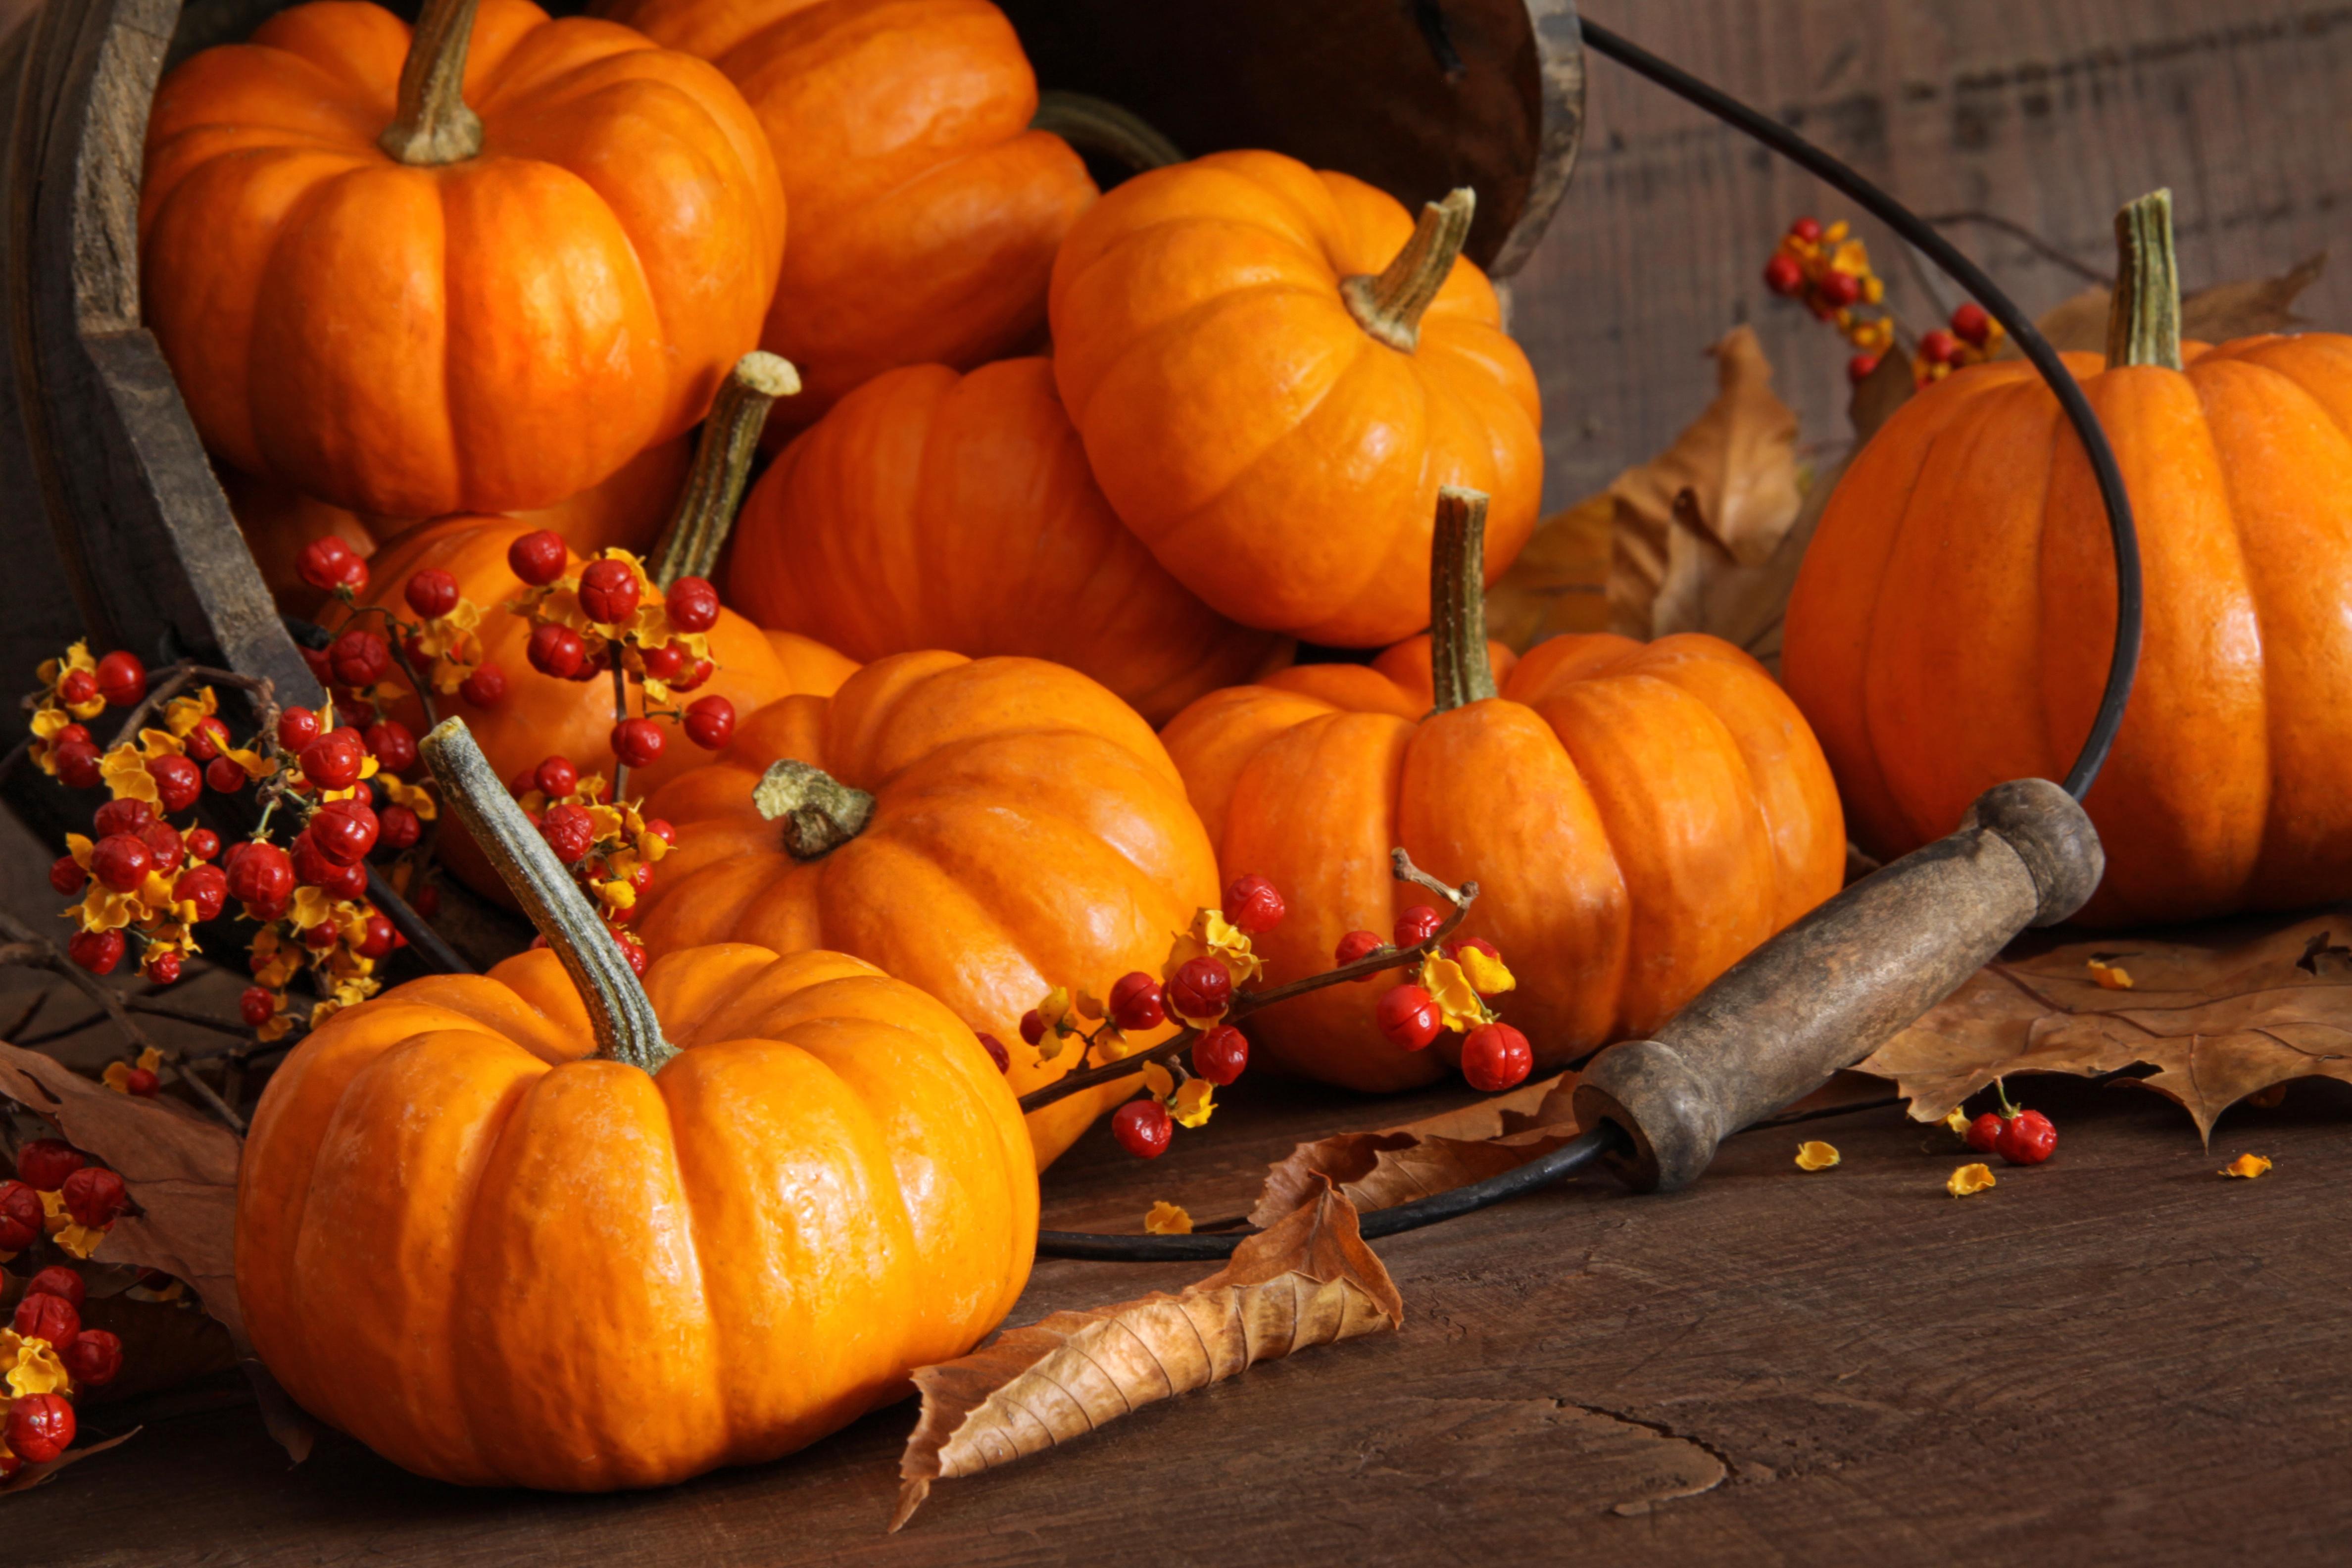 pumpkin_fall_thanksgiving_harvest_AdobeStock_27116564.jpeg